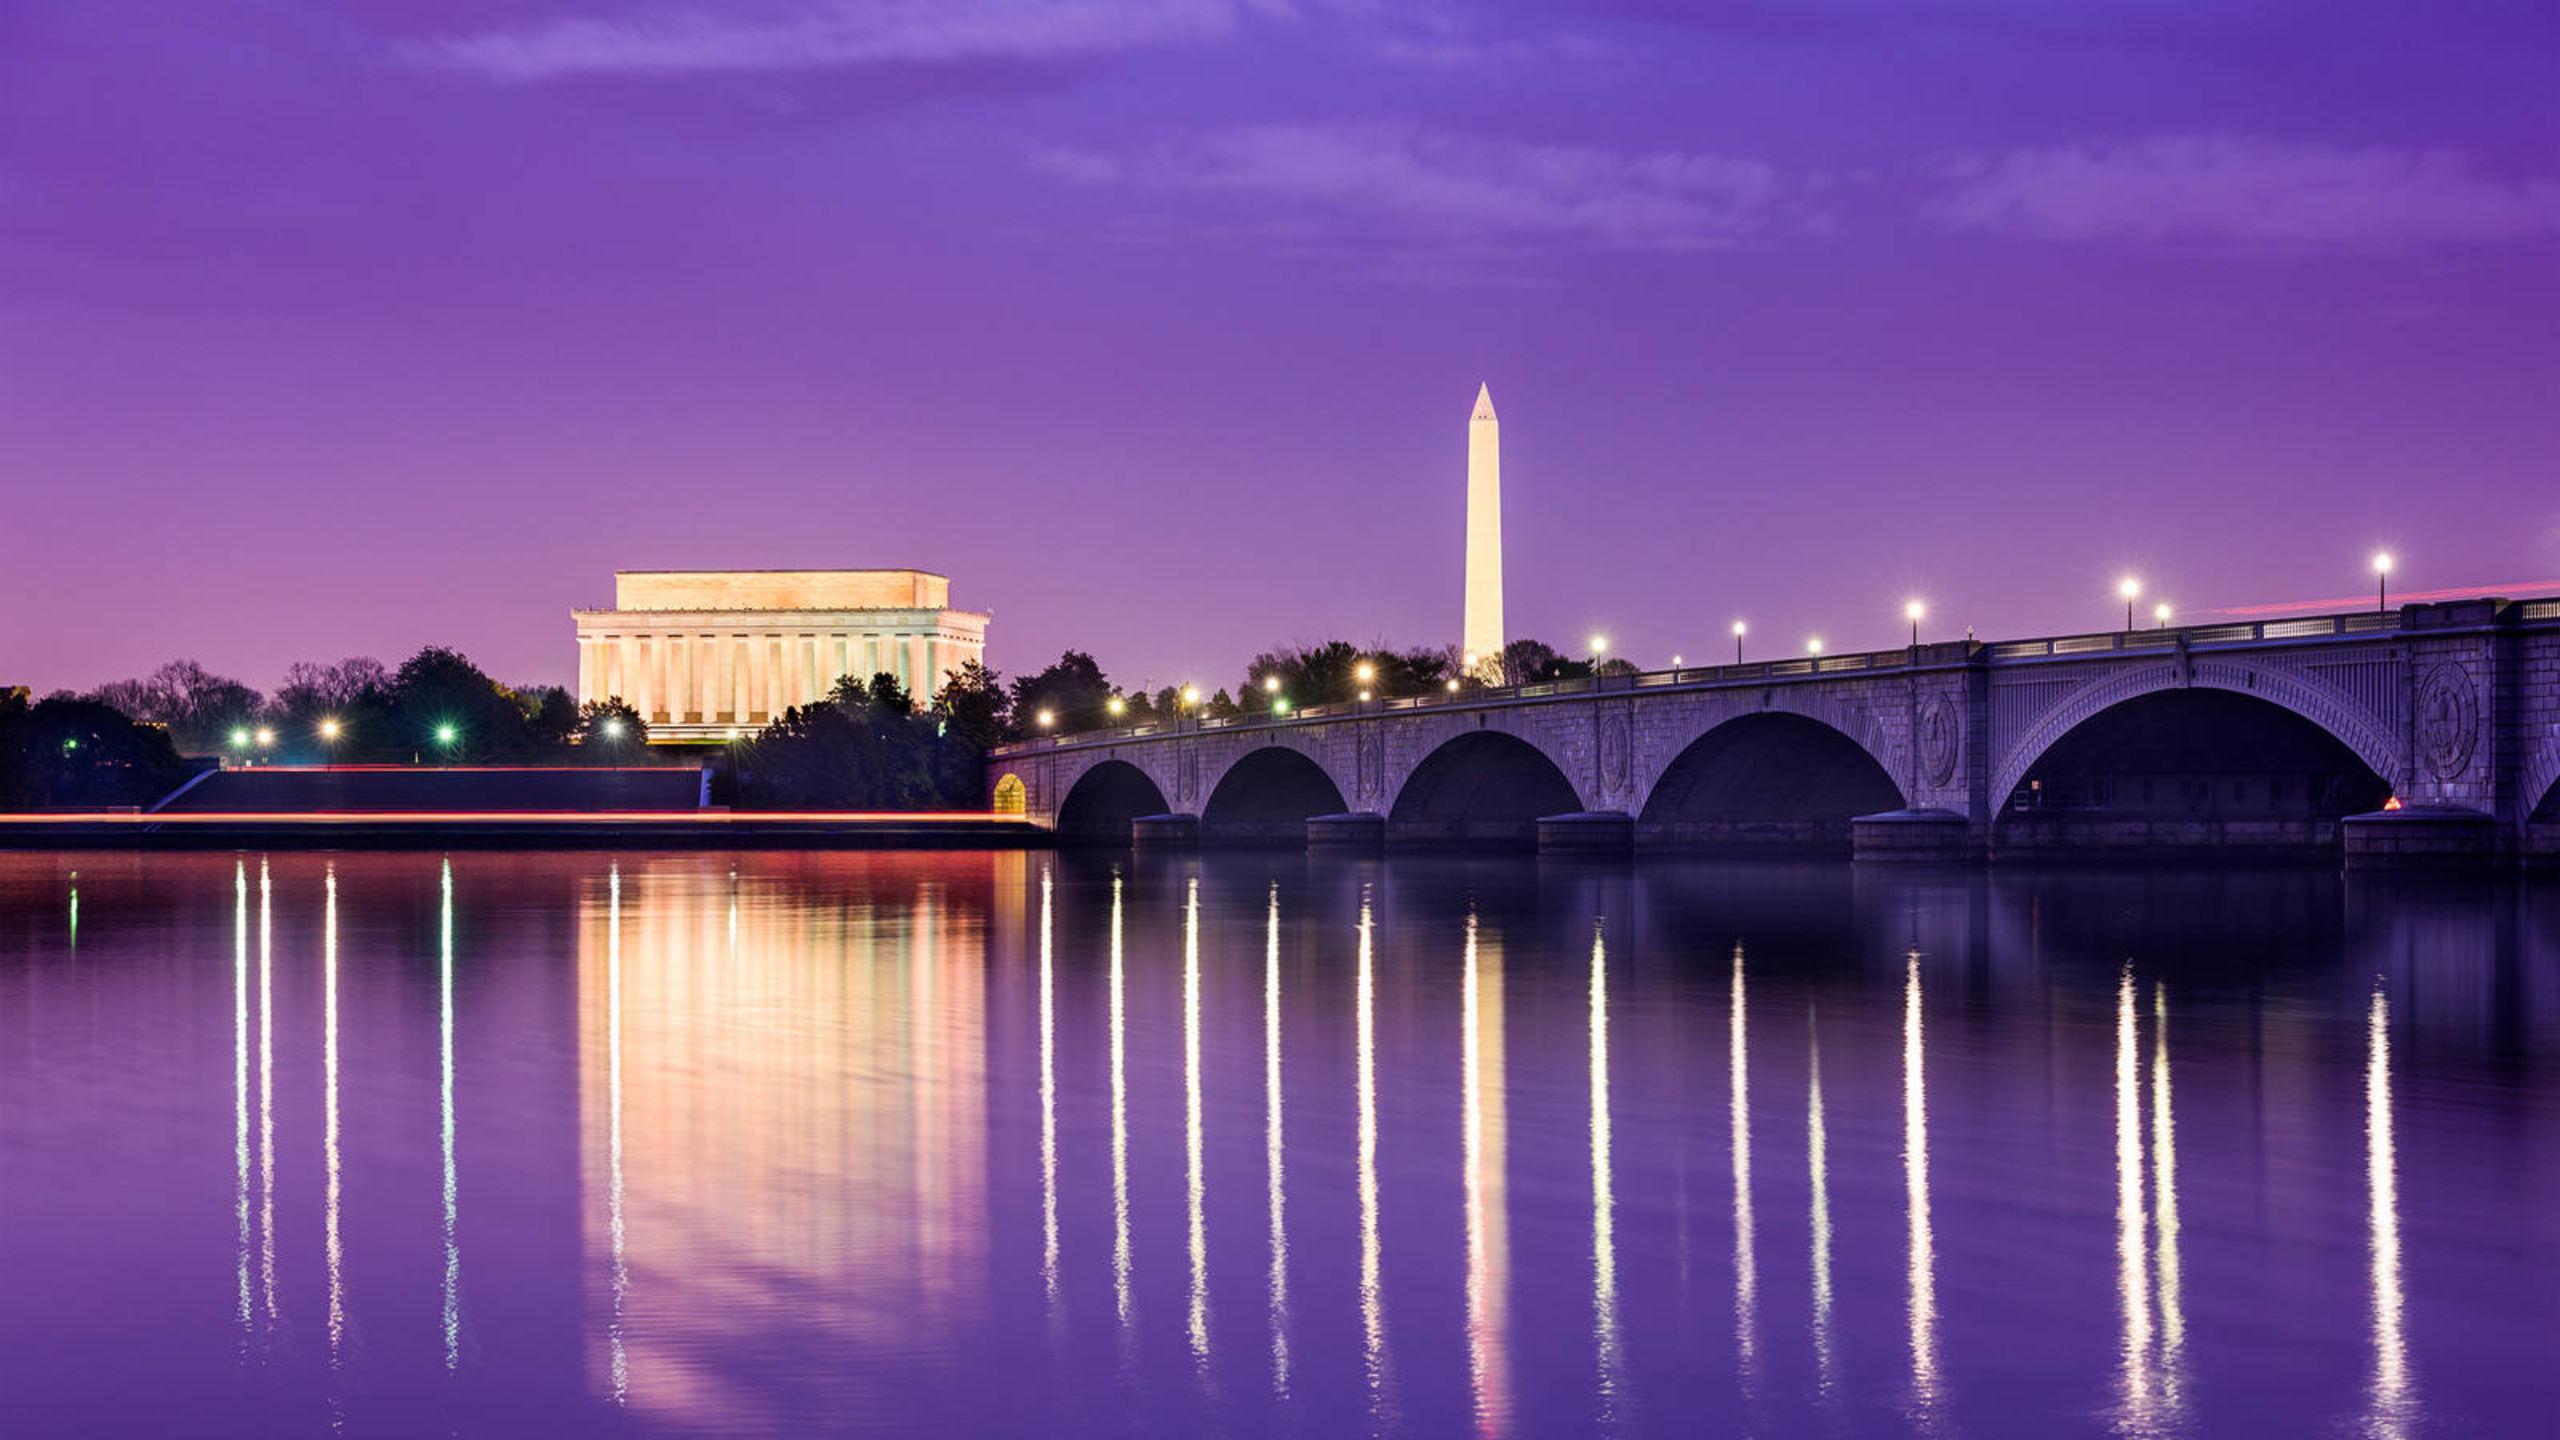 Washington D.C. Region